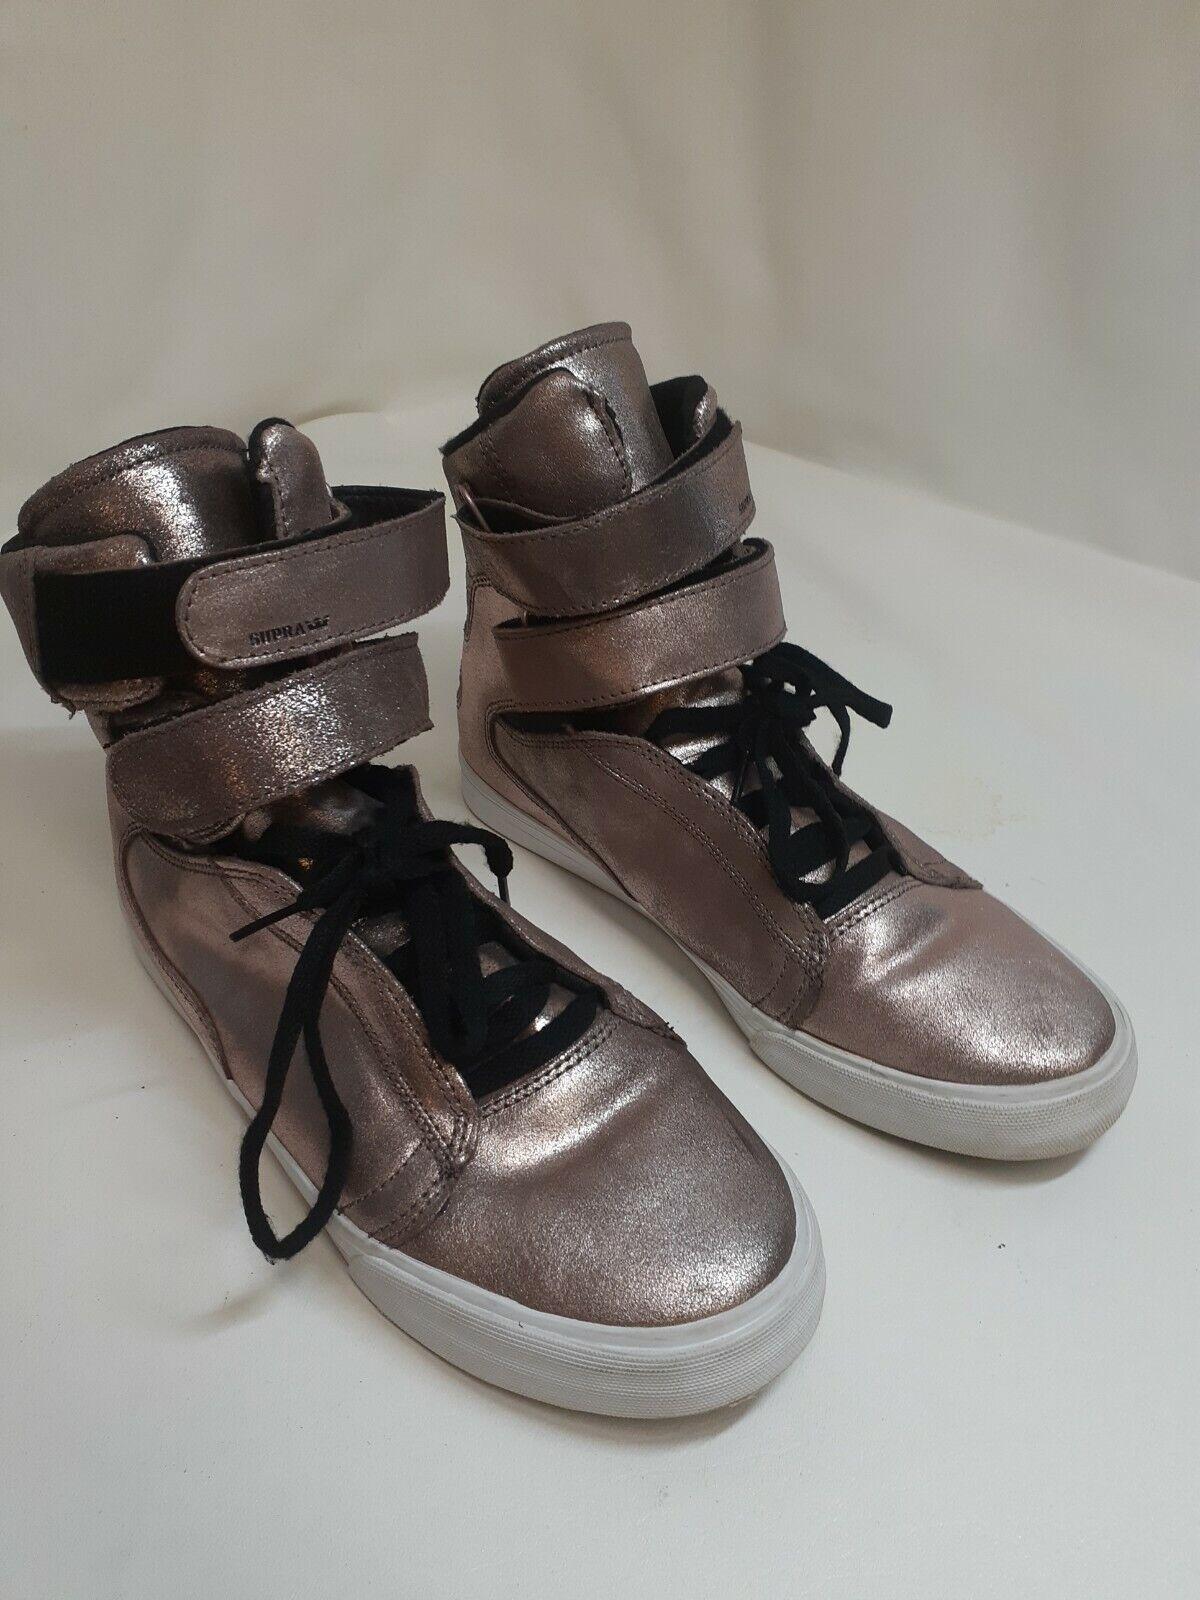 men's 10 m Supra TK Society Gold copper Hi Top fashion Sneakers Shoes